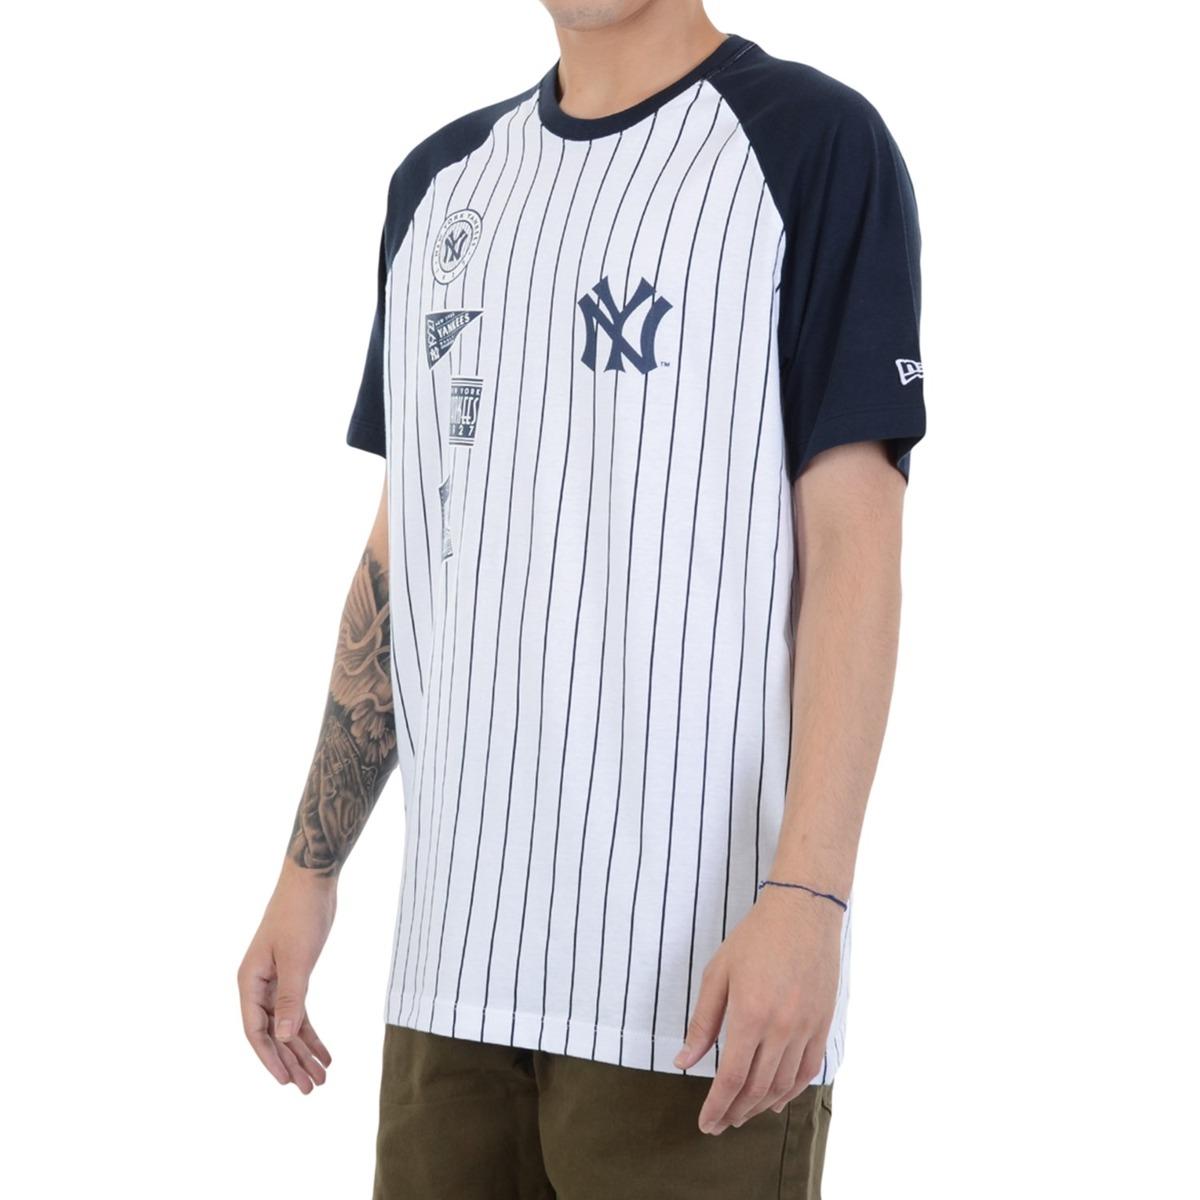 camiseta new era 25 team new york yankees branca. Carregando zoom. 96a14faf392